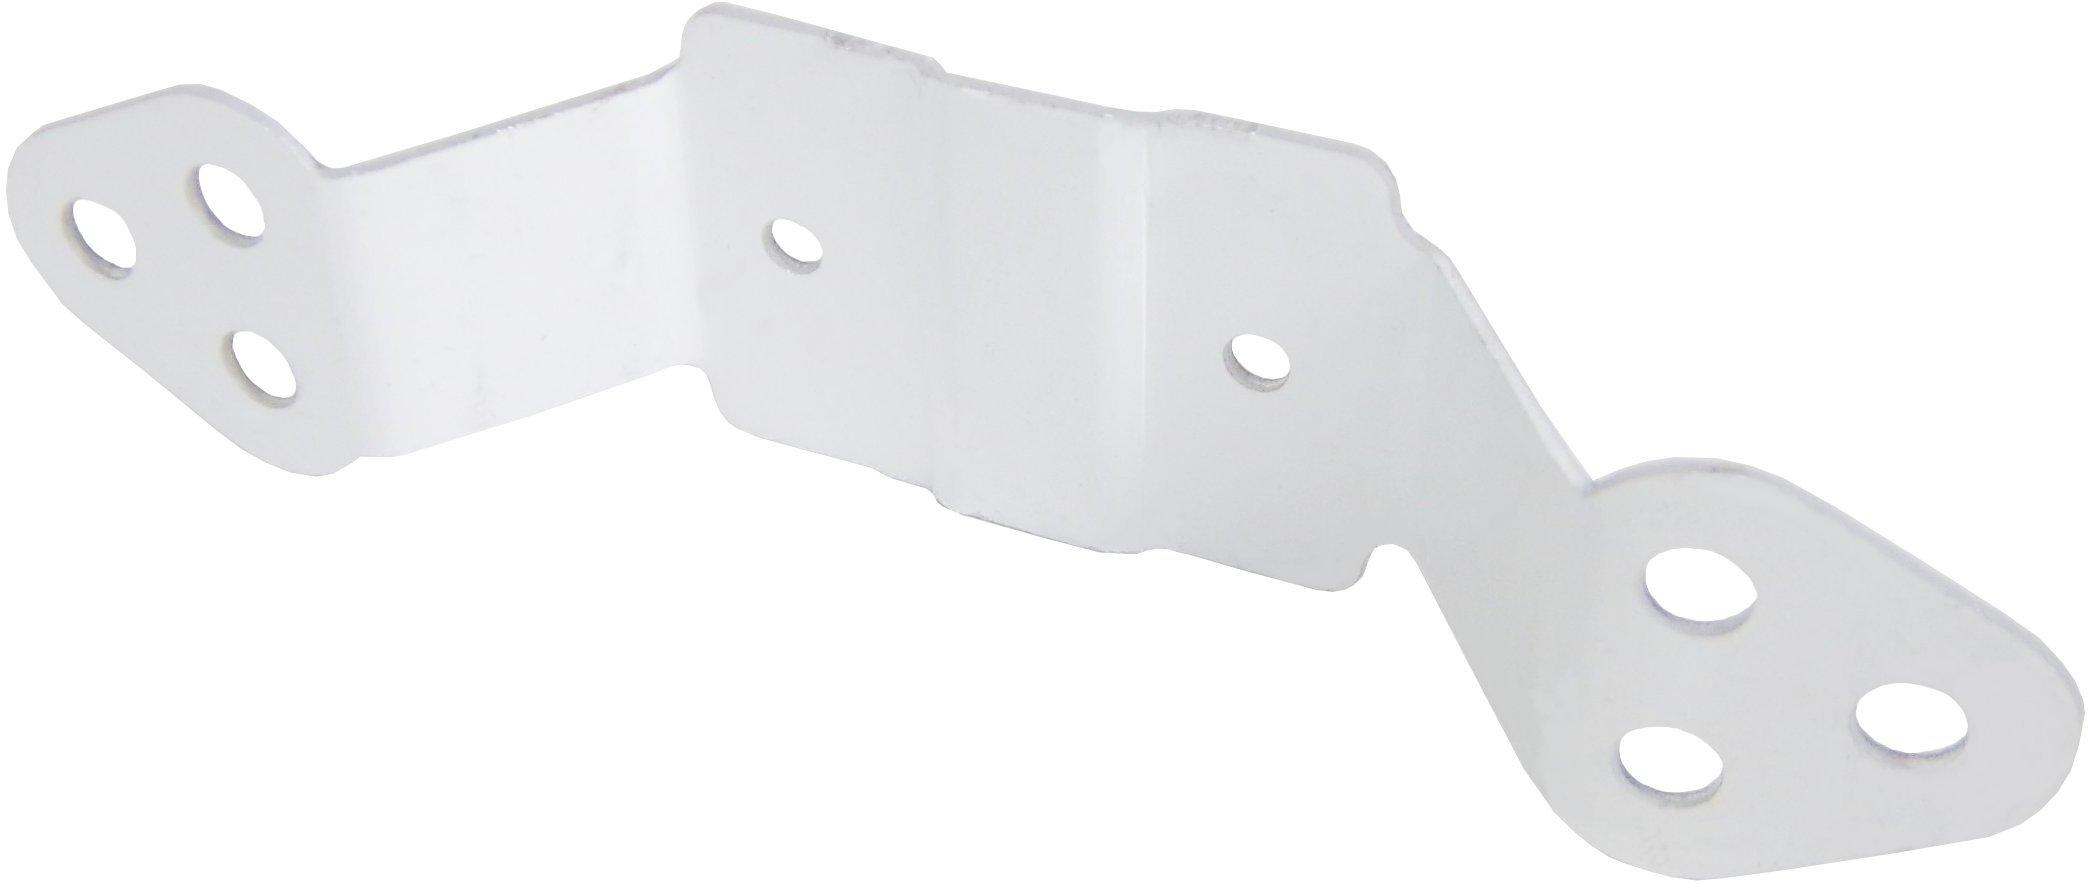 Aluminum Pipe Cleat Gutter Brackets